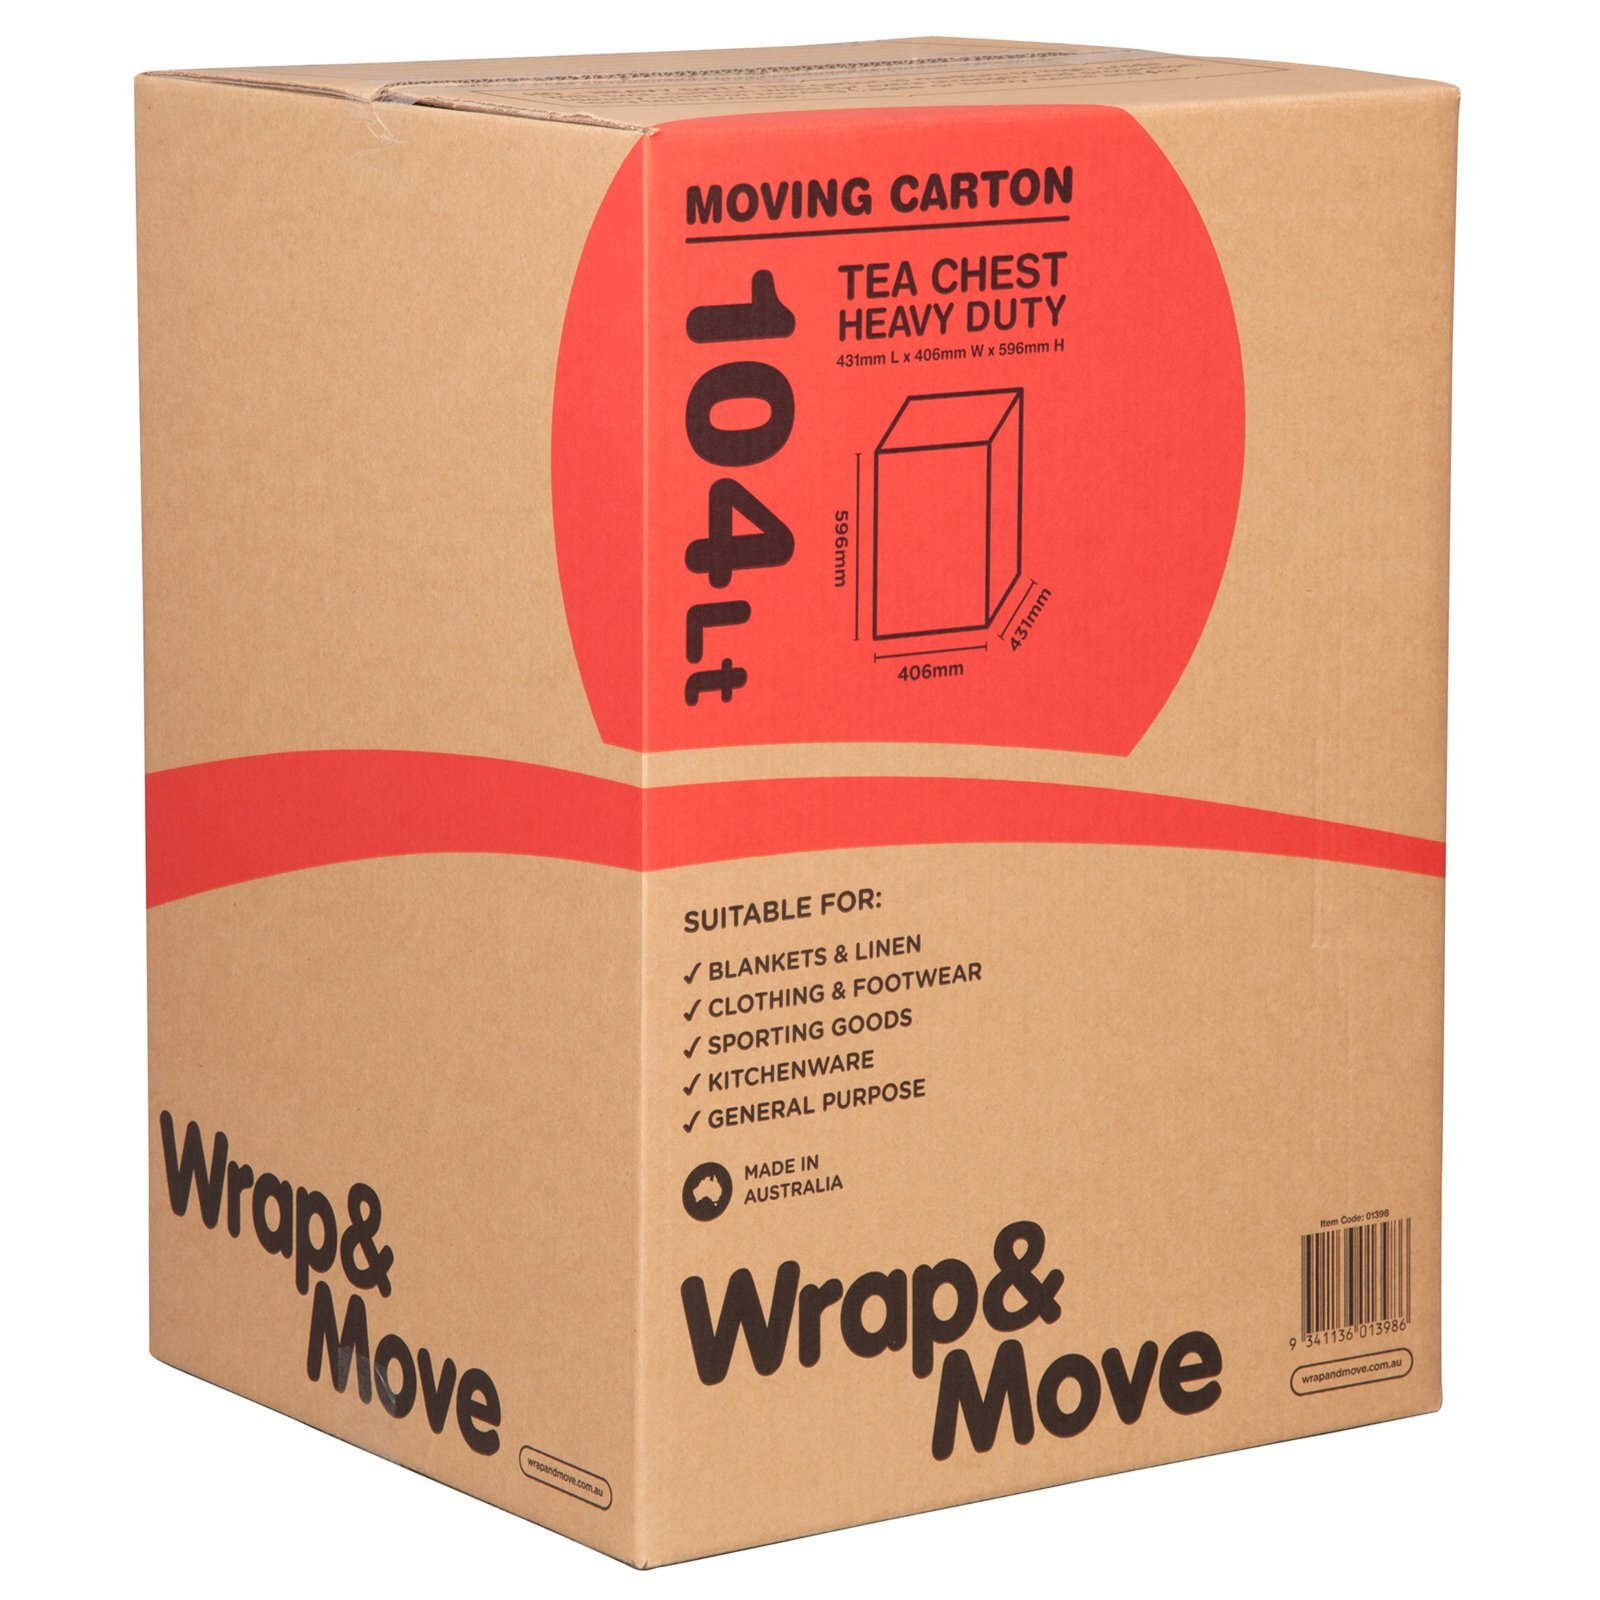 Wrap & Move 104Lt Heavy Duty Tea Chest Moving Carton